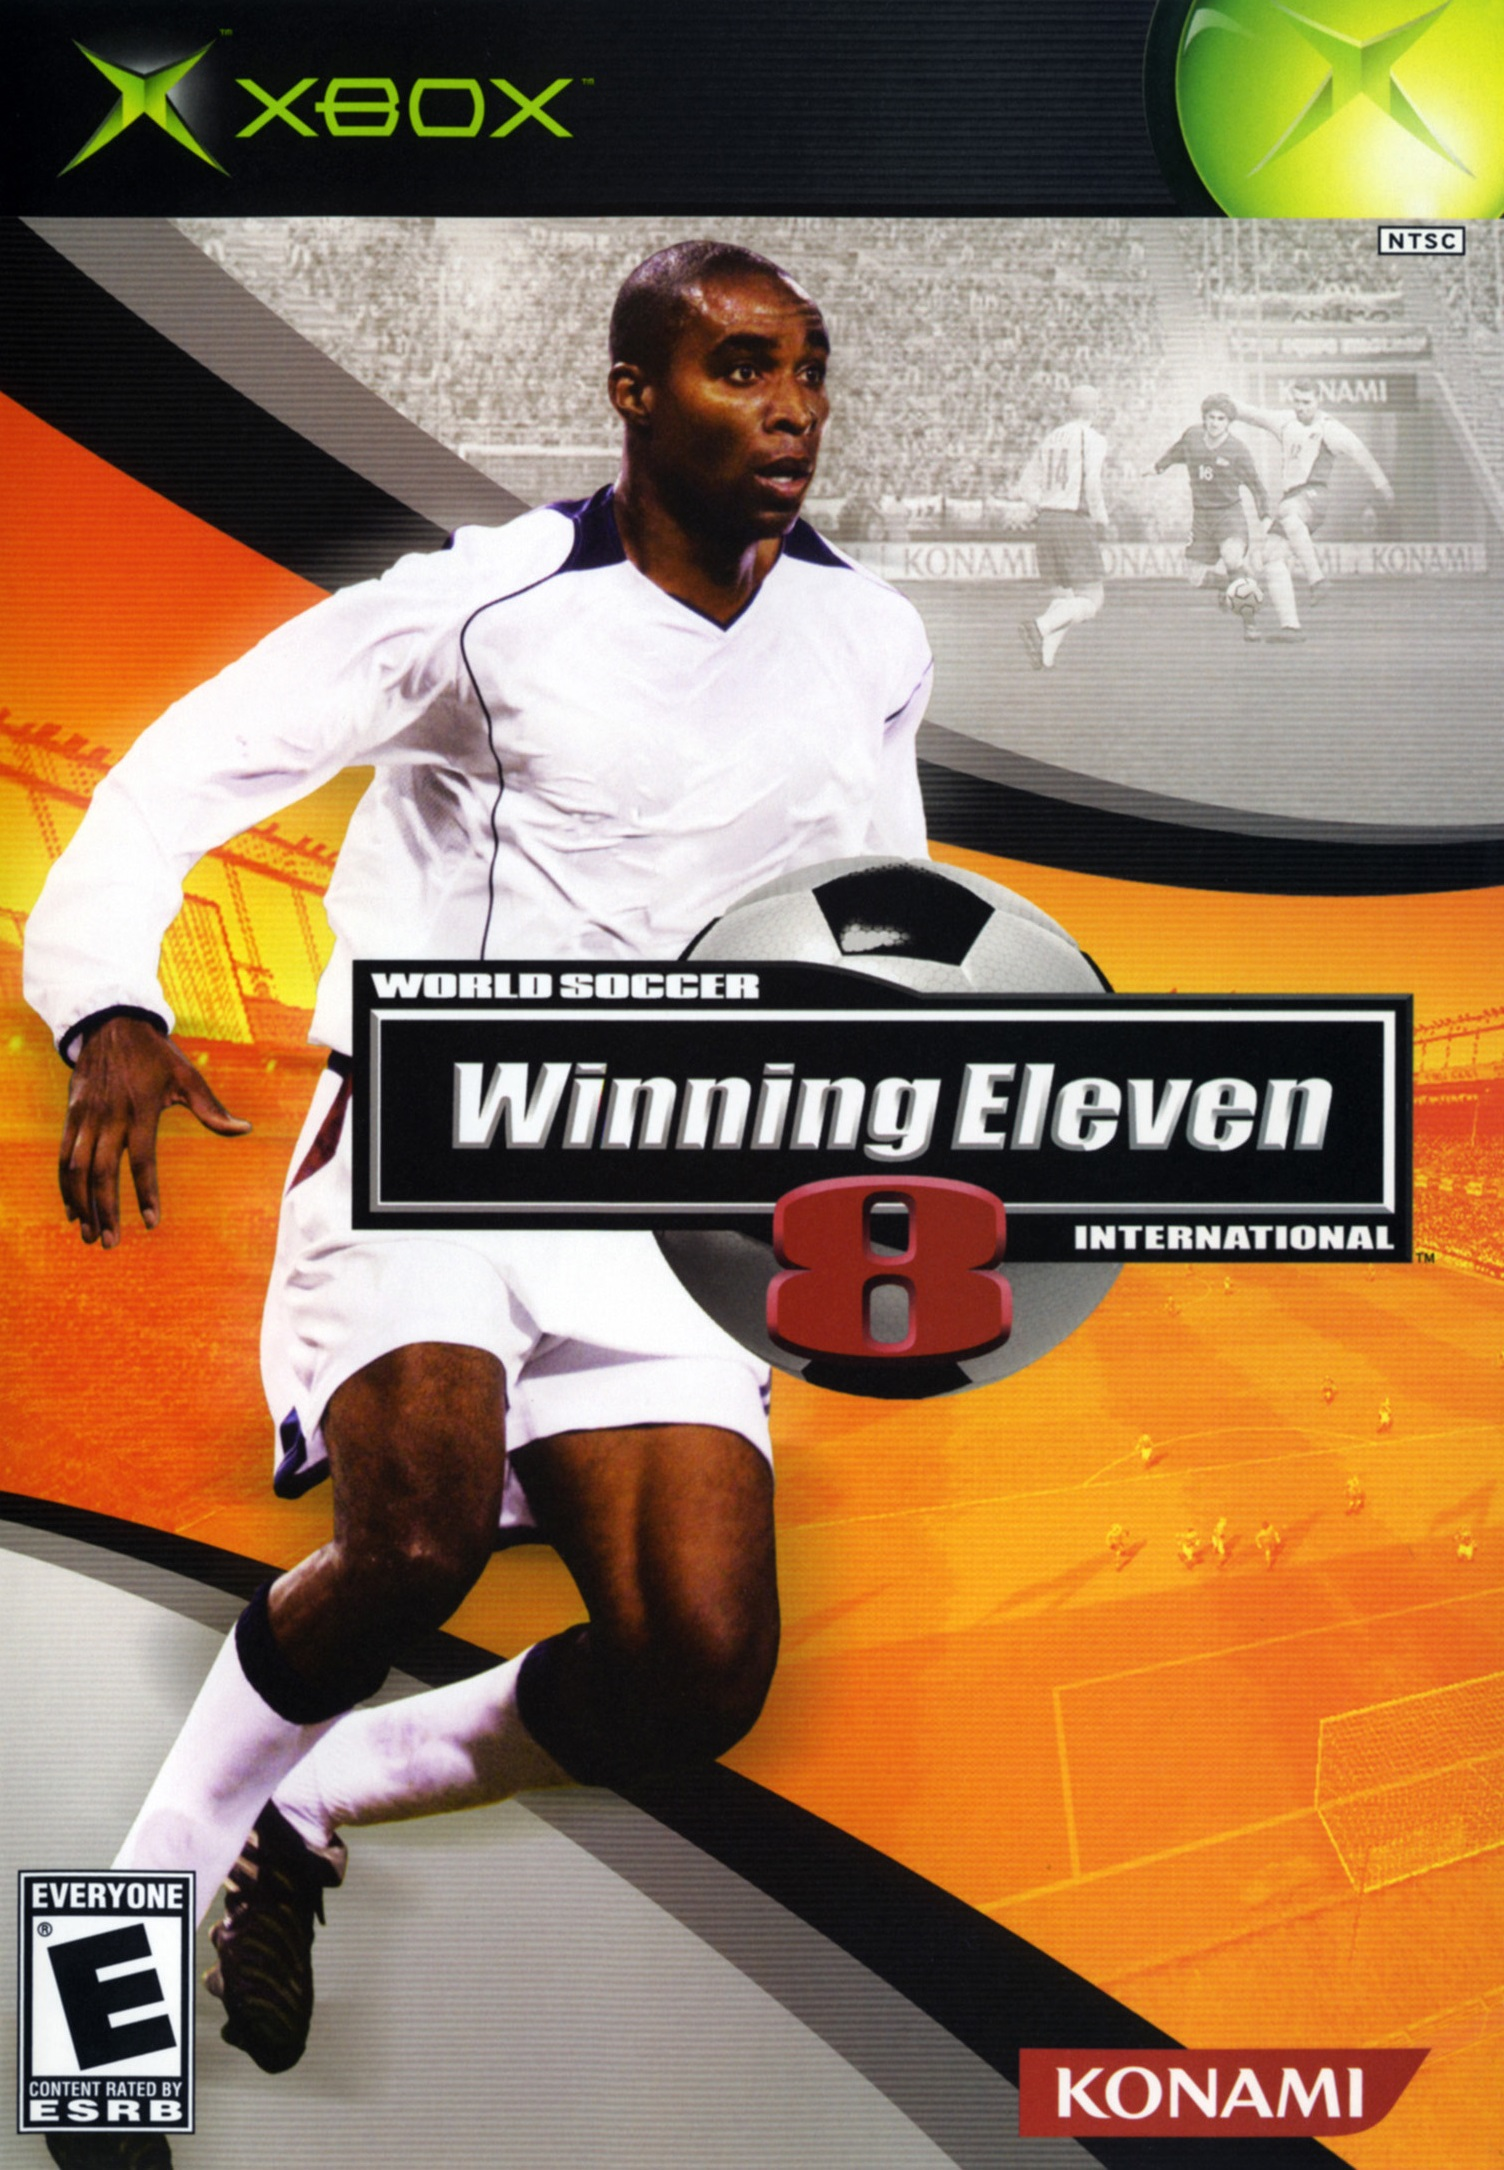 xbox winning eleven 8: